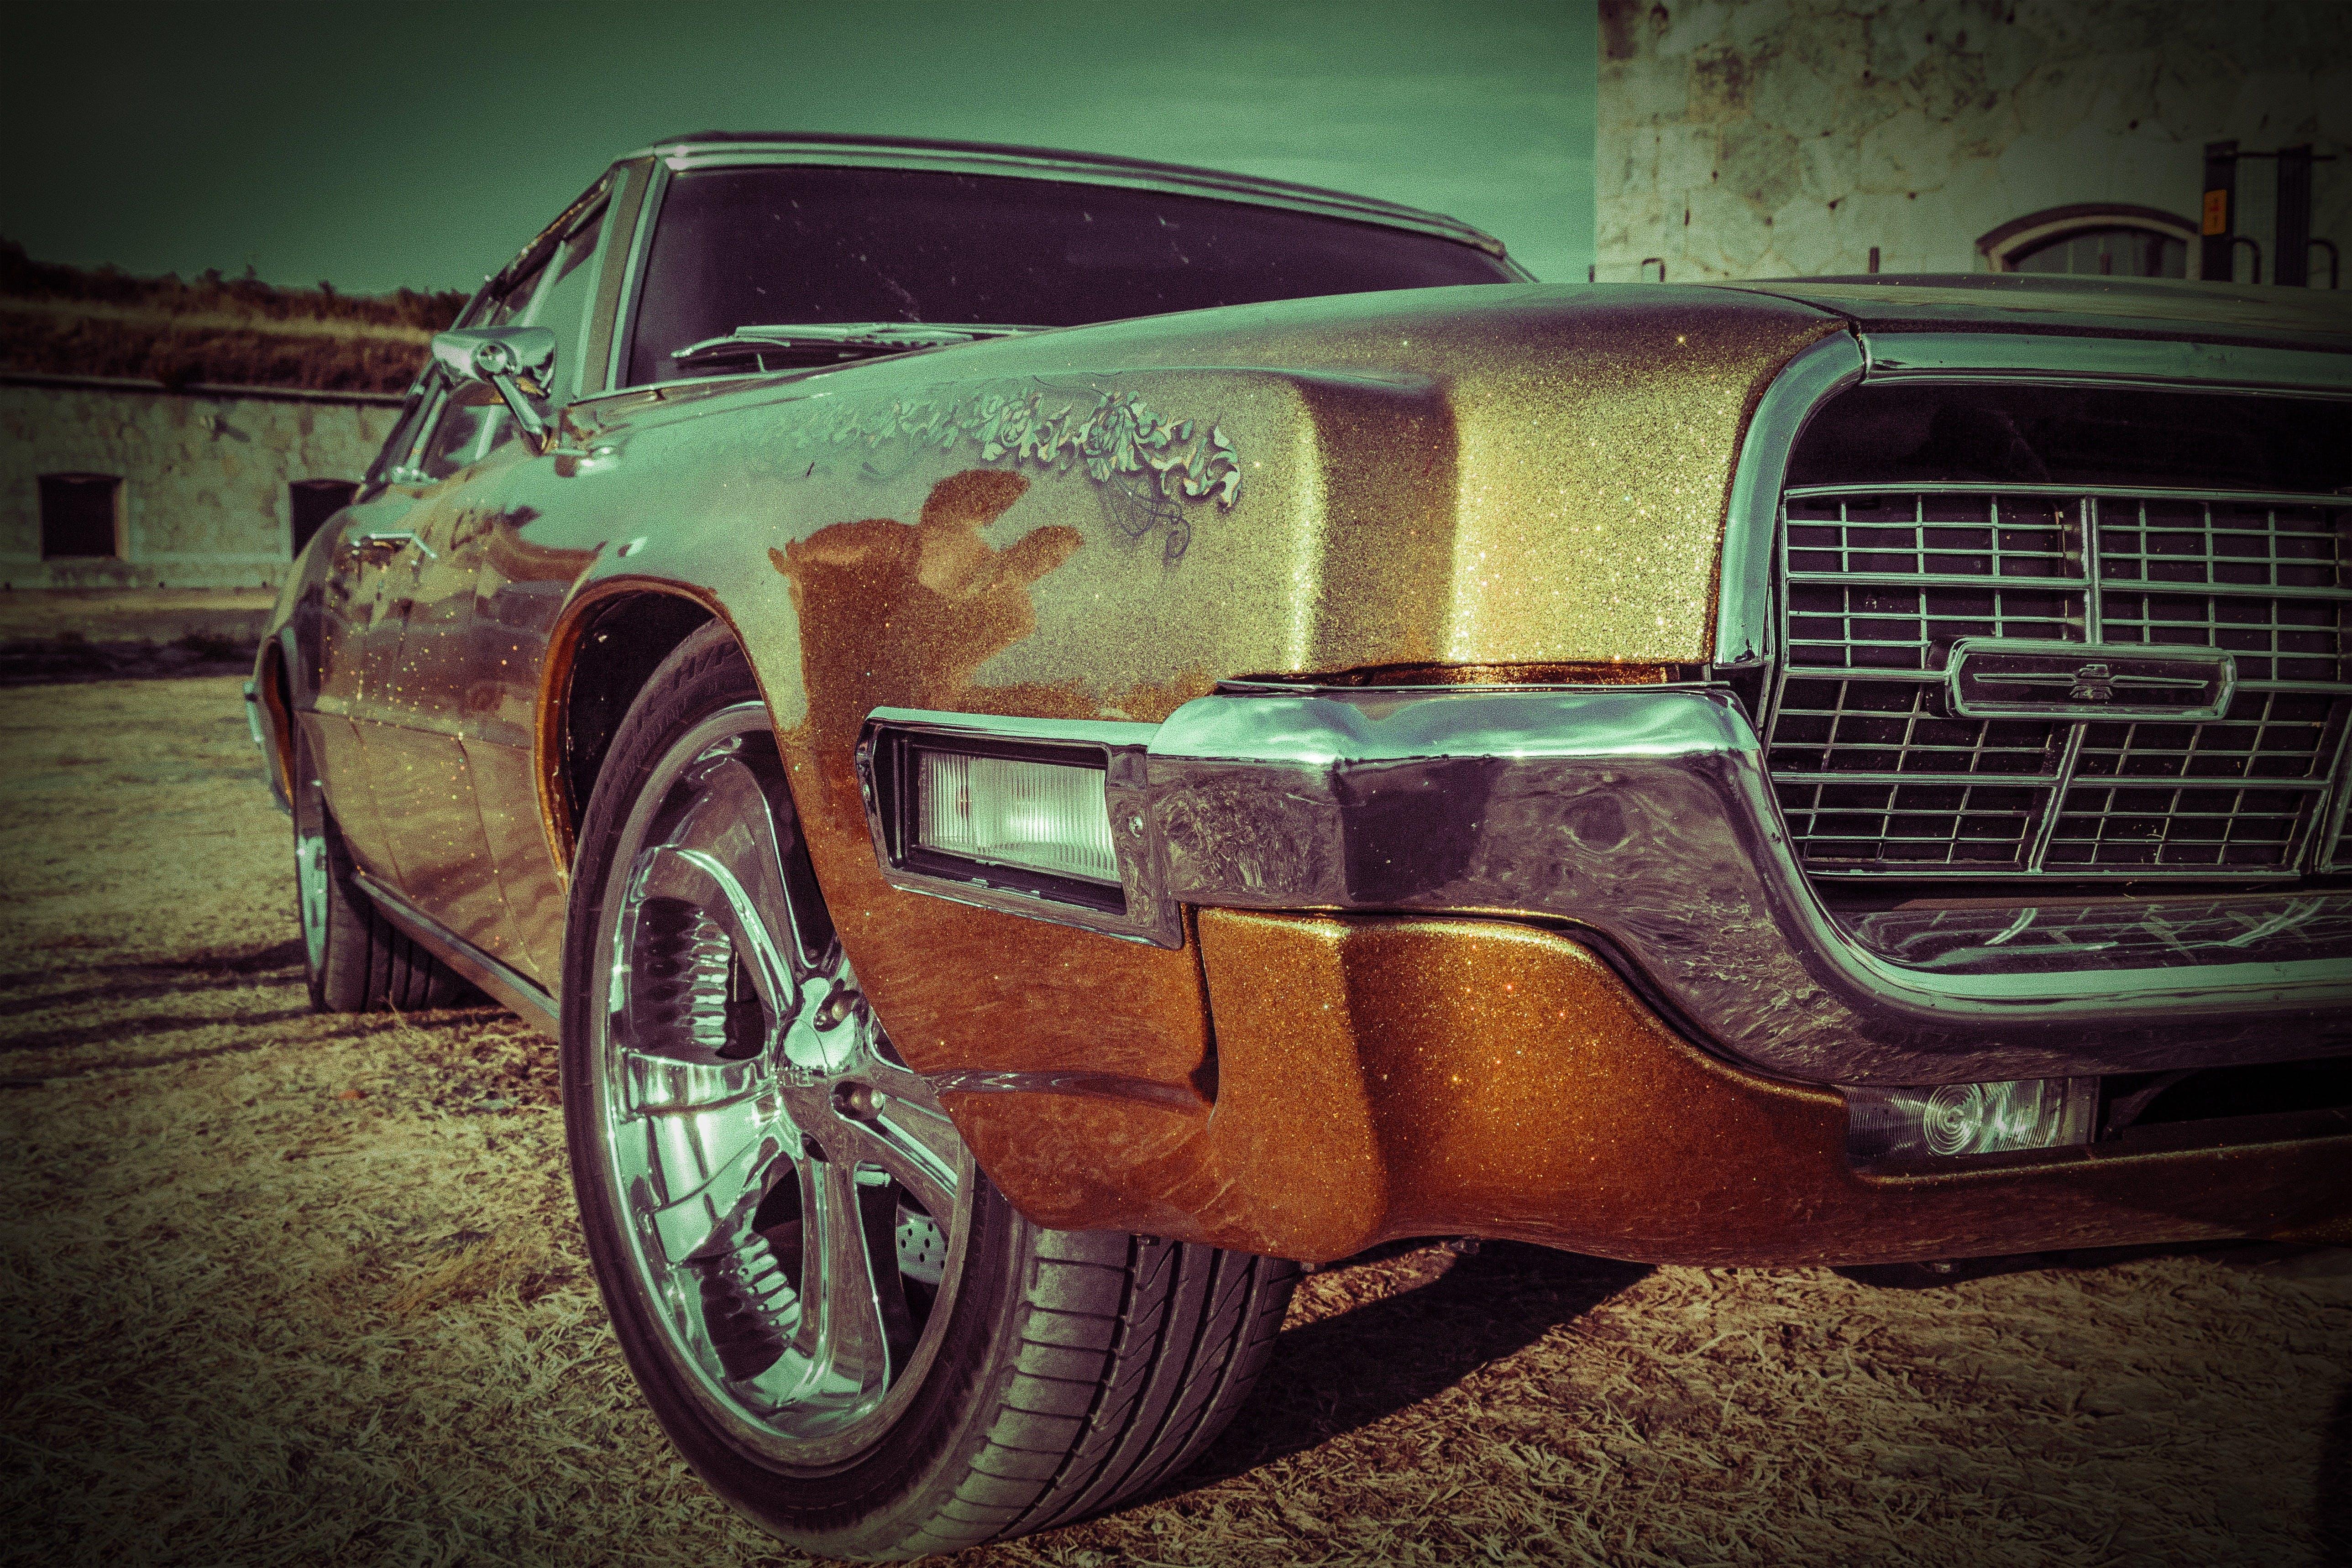 american car, car, classic